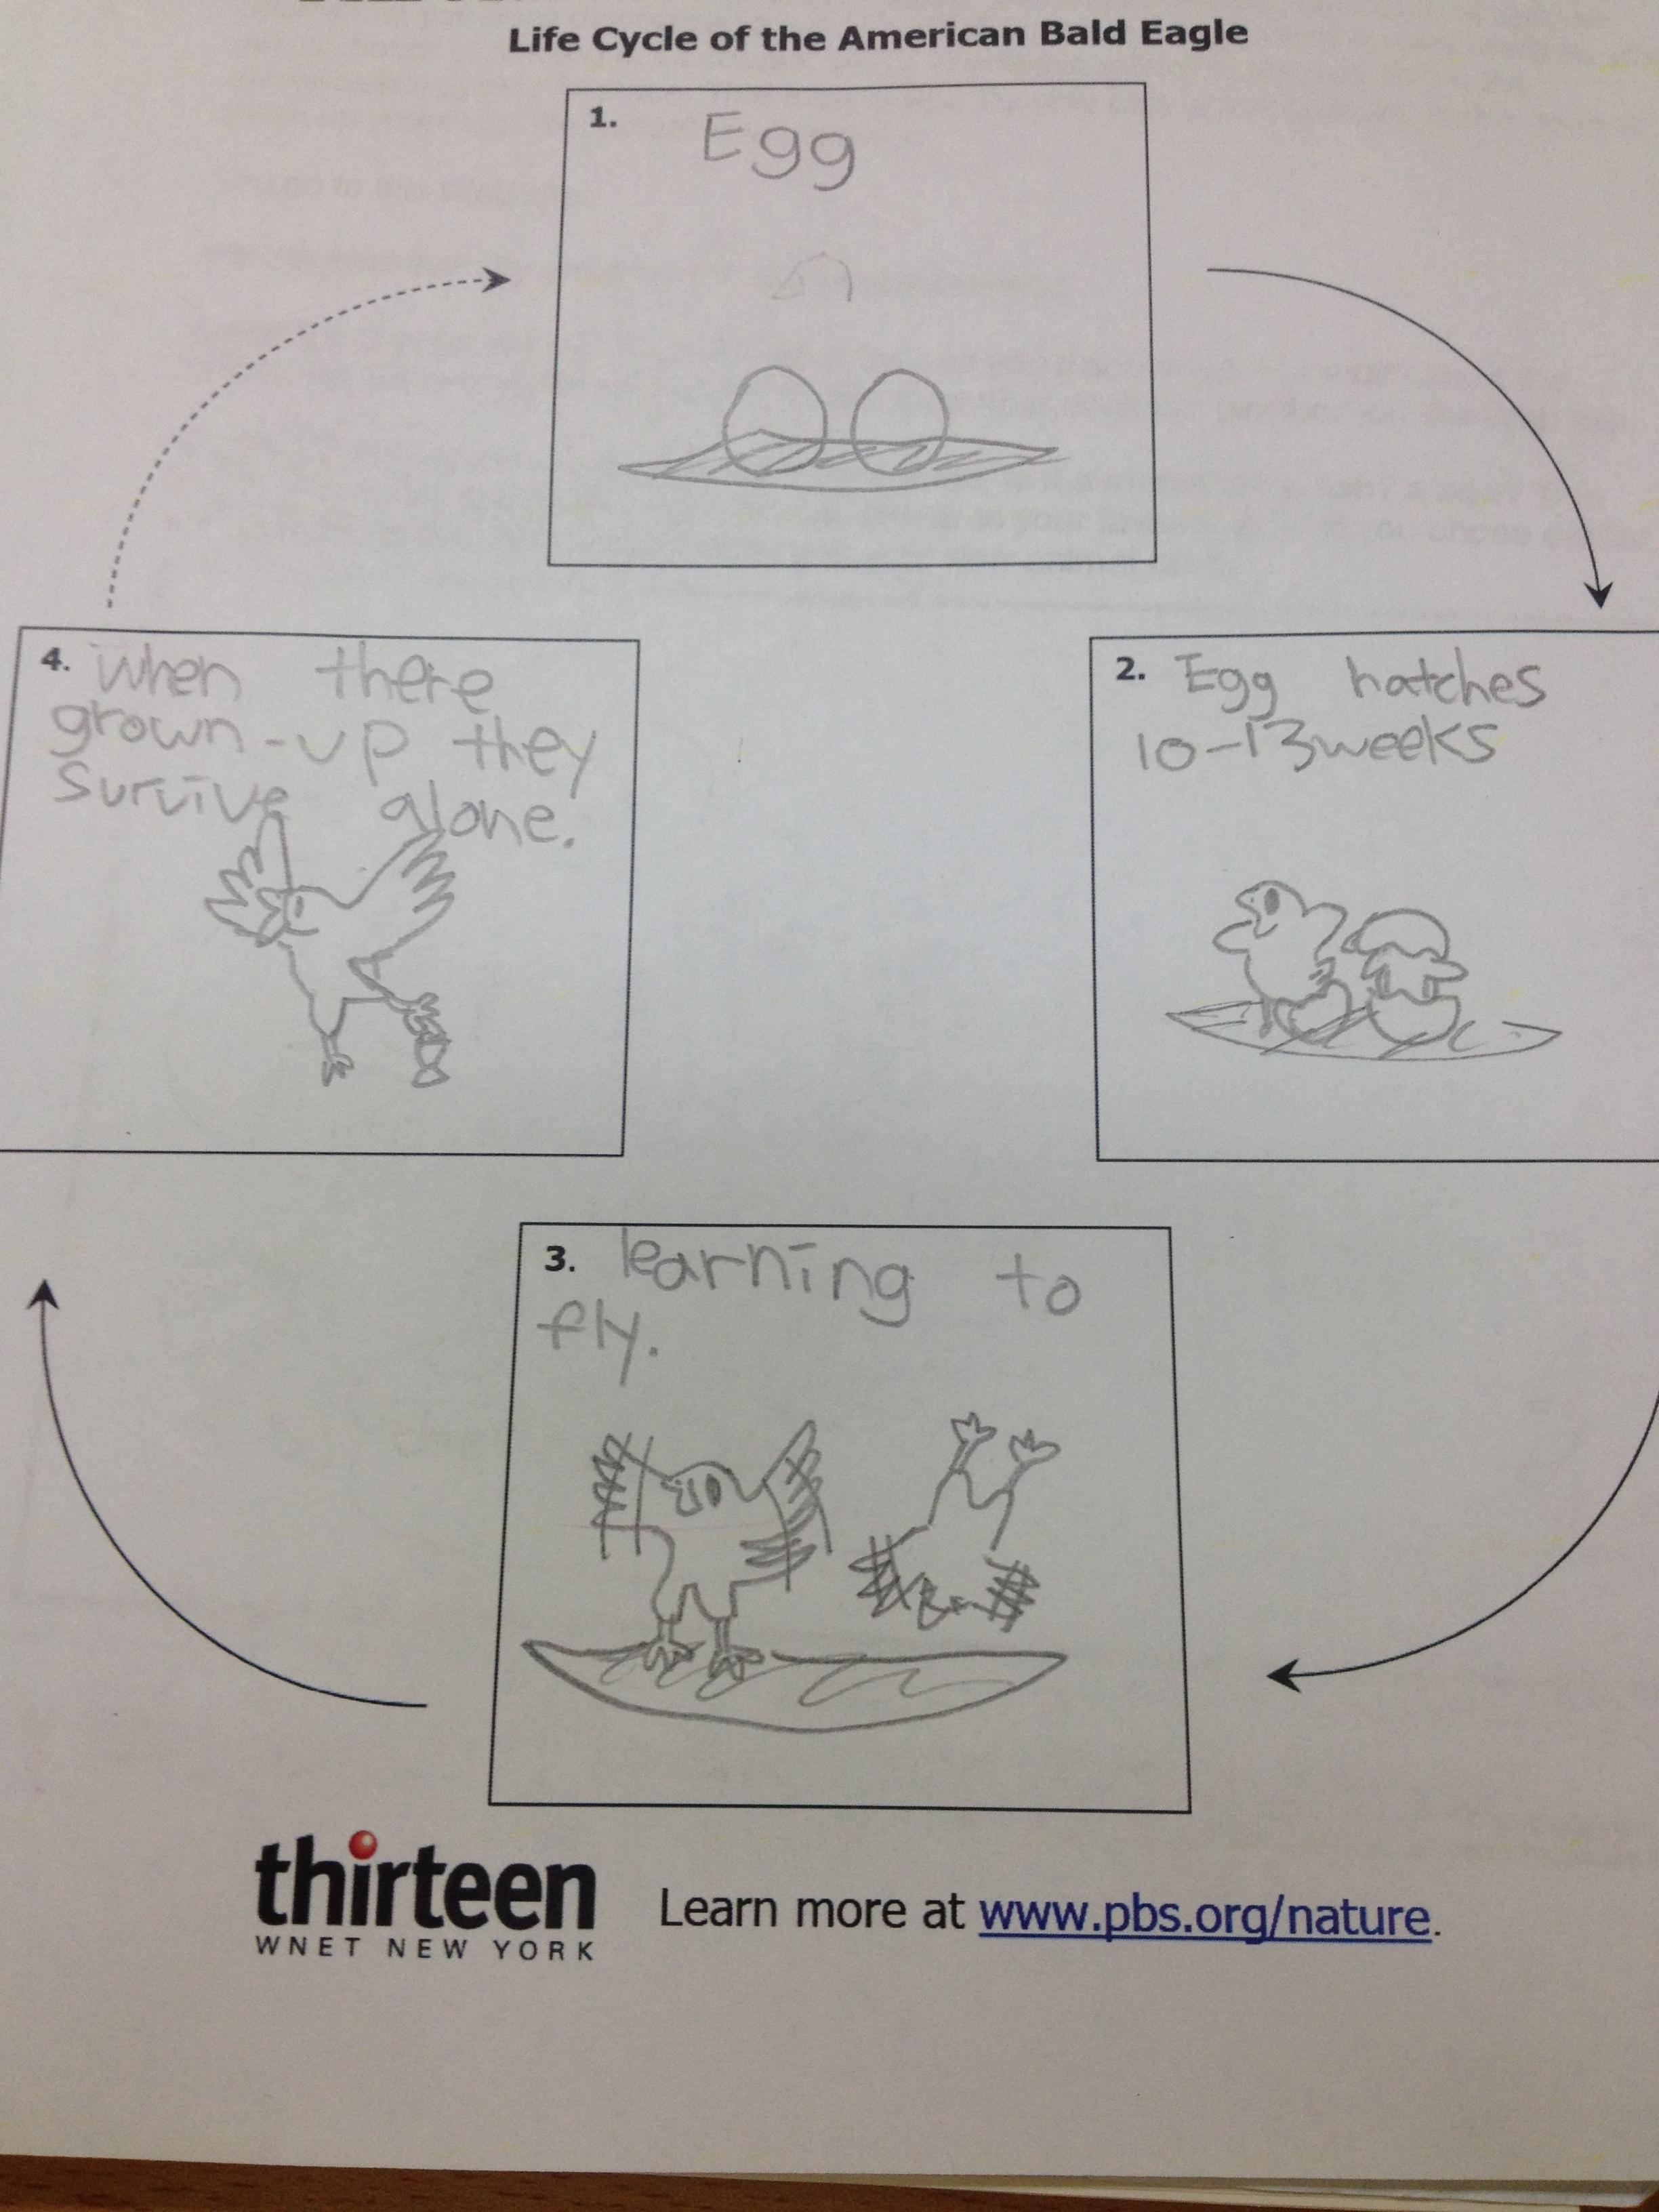 Bald Eagle Life Cycle For Kids